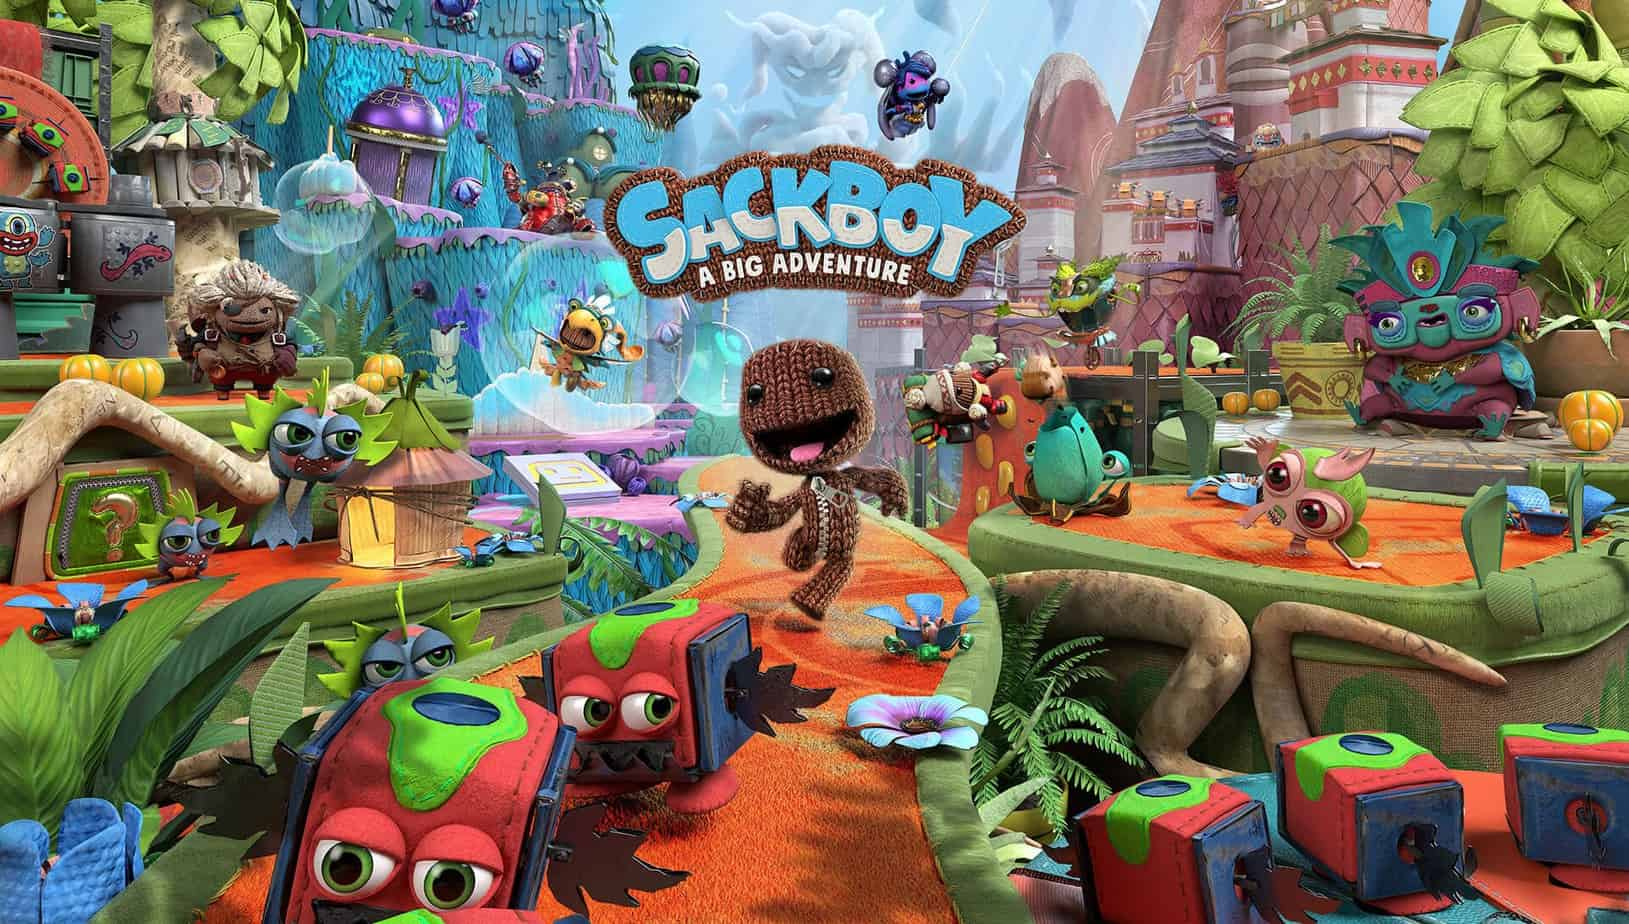 Sackboy: A Big Adventure графика проекта